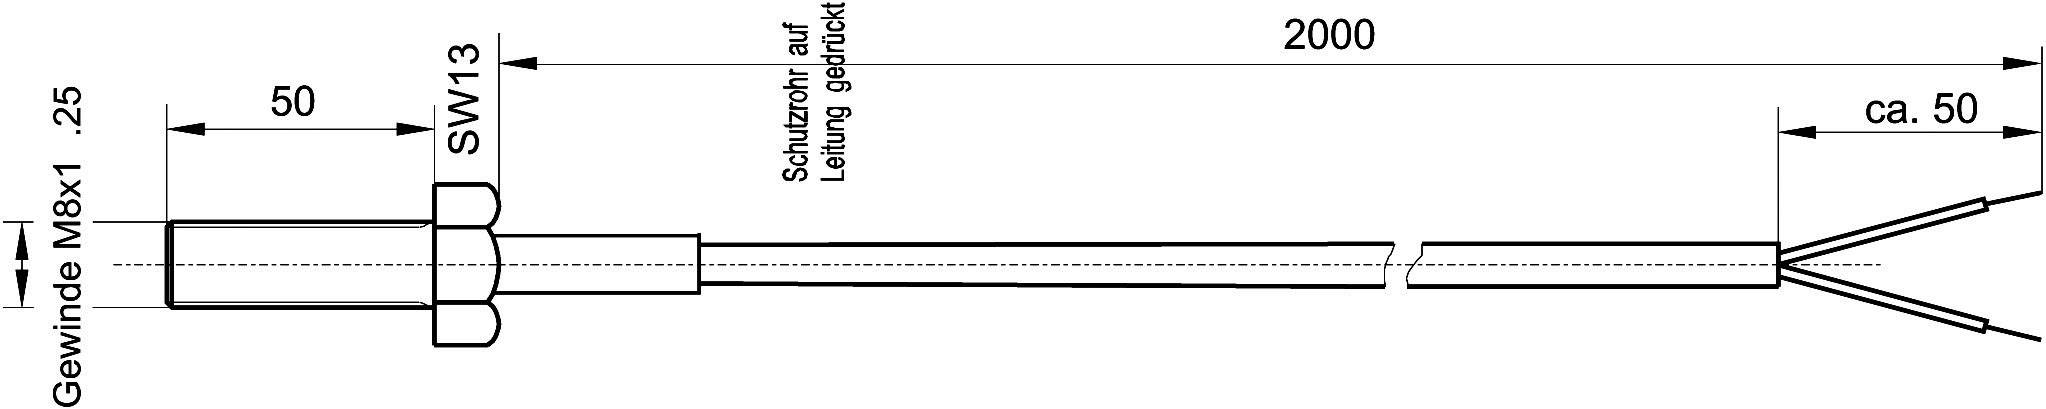 Teplotný senzor Enda K4-TC-J, -50 do 400 °C, 2 m, 7.97 mm